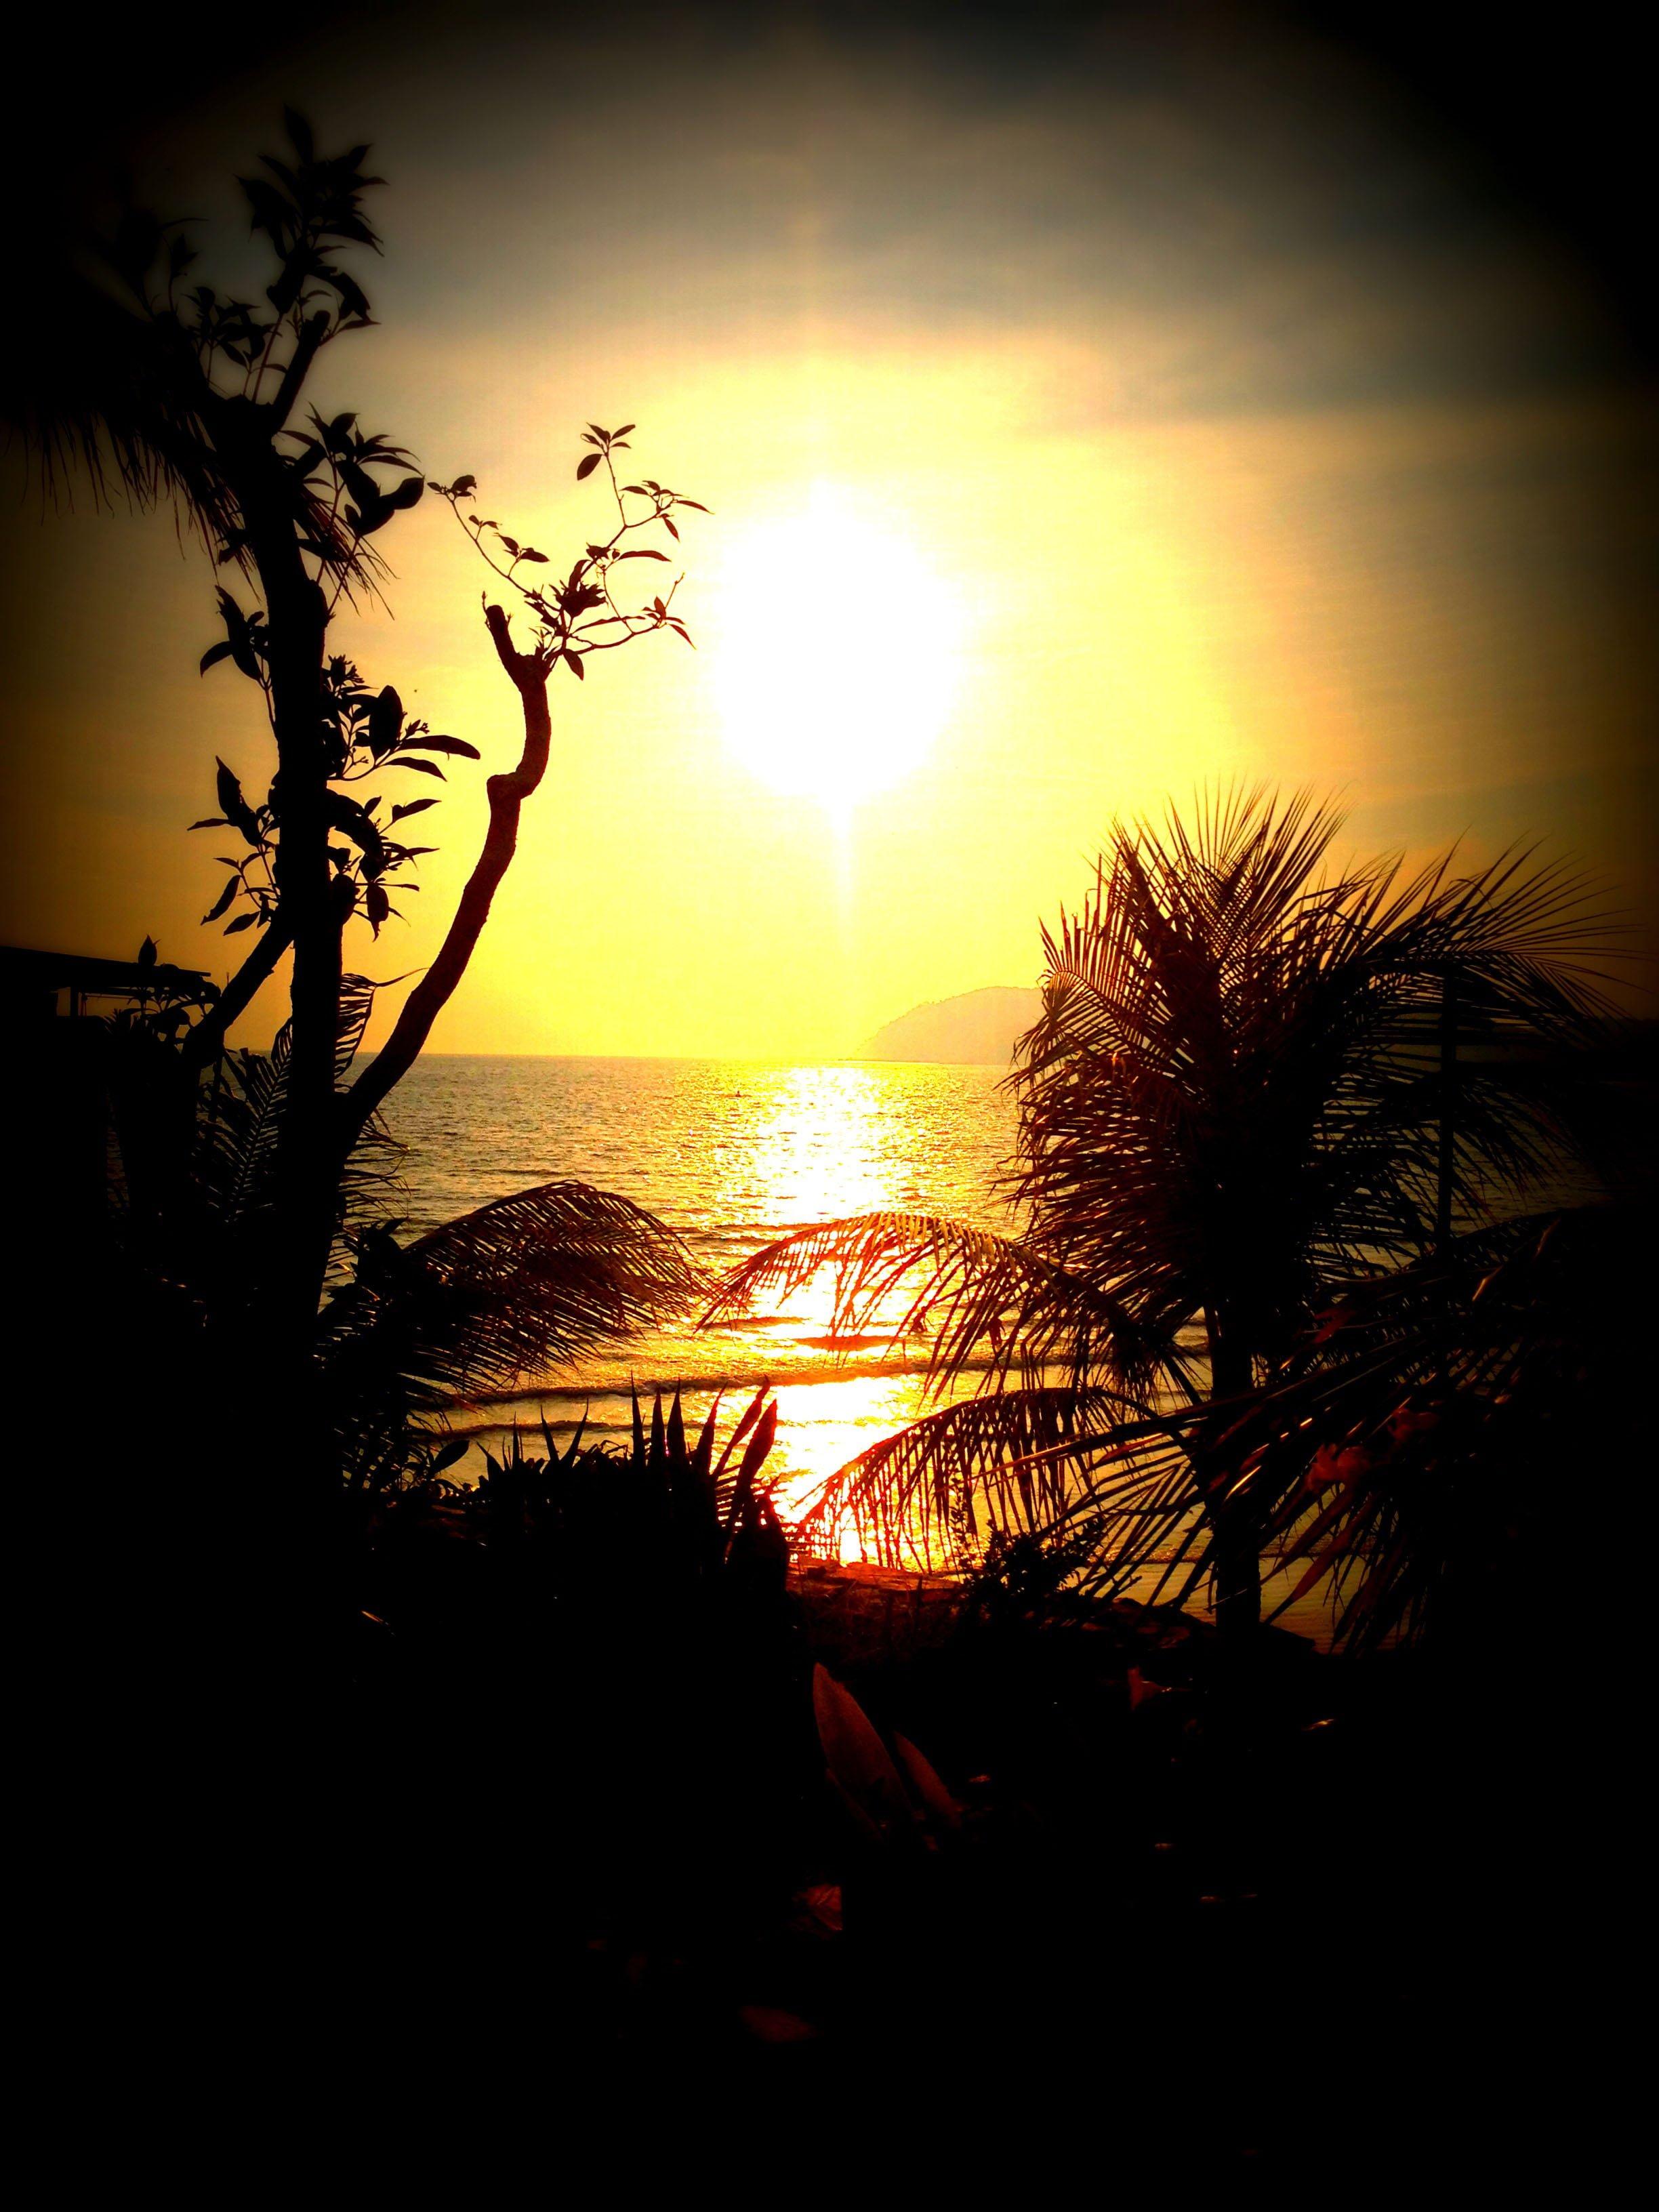 Wallpaper Wanderer: Sunset in Langkawi